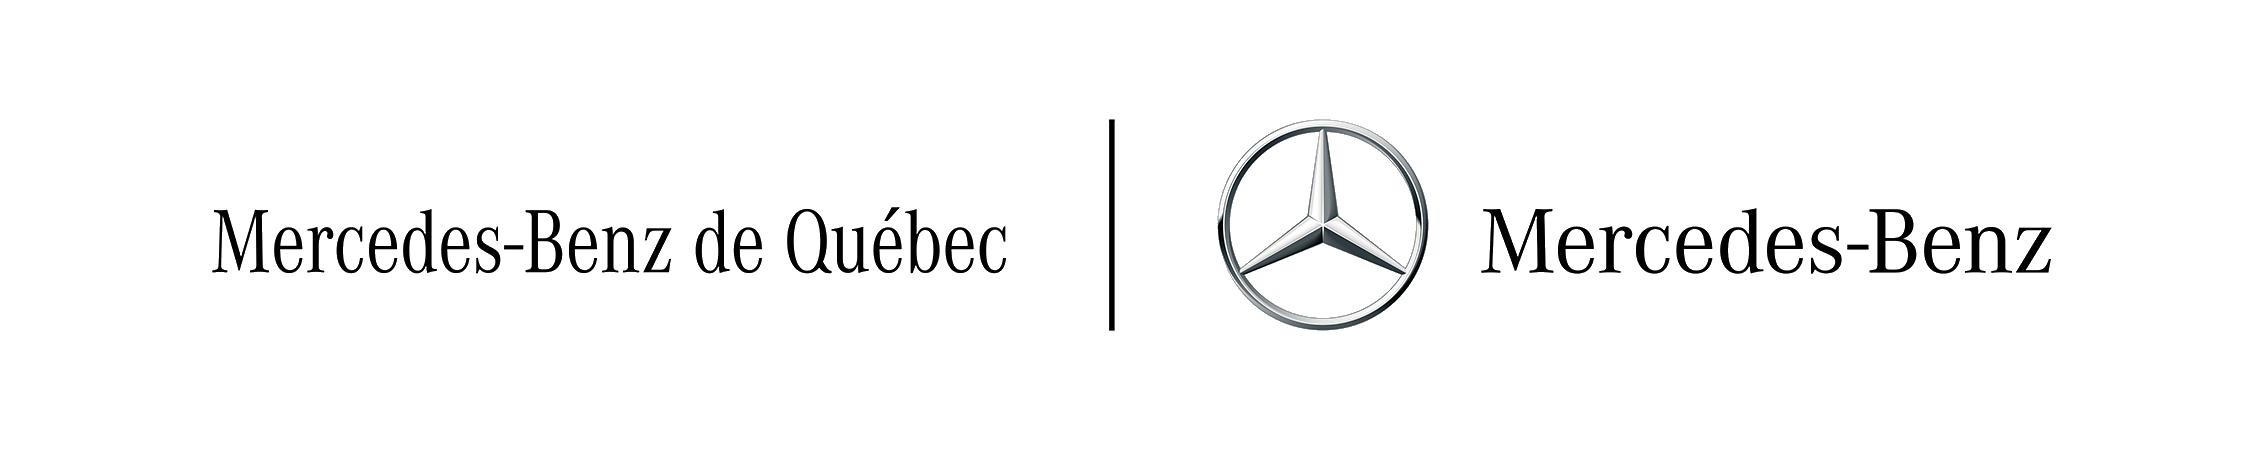 MercedesBenzQuebec- PNG